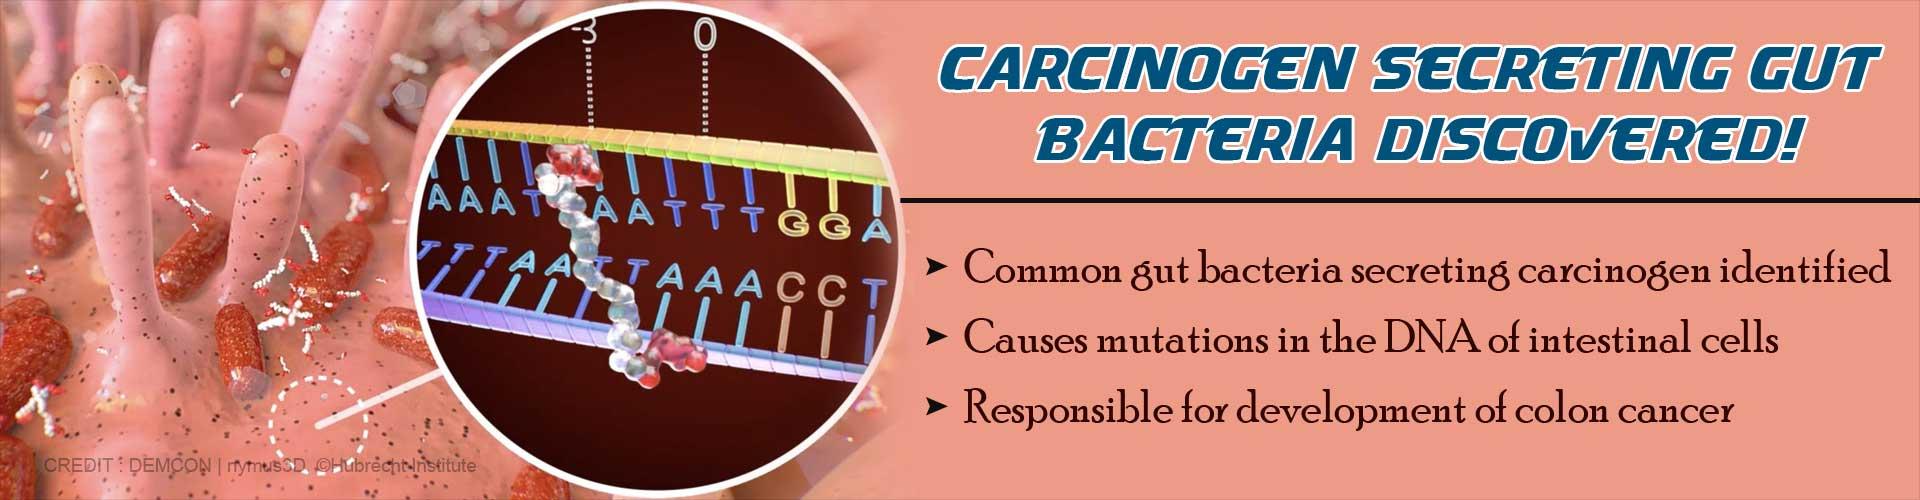 Gut Bacteria can Secrete Carcinogen: Study